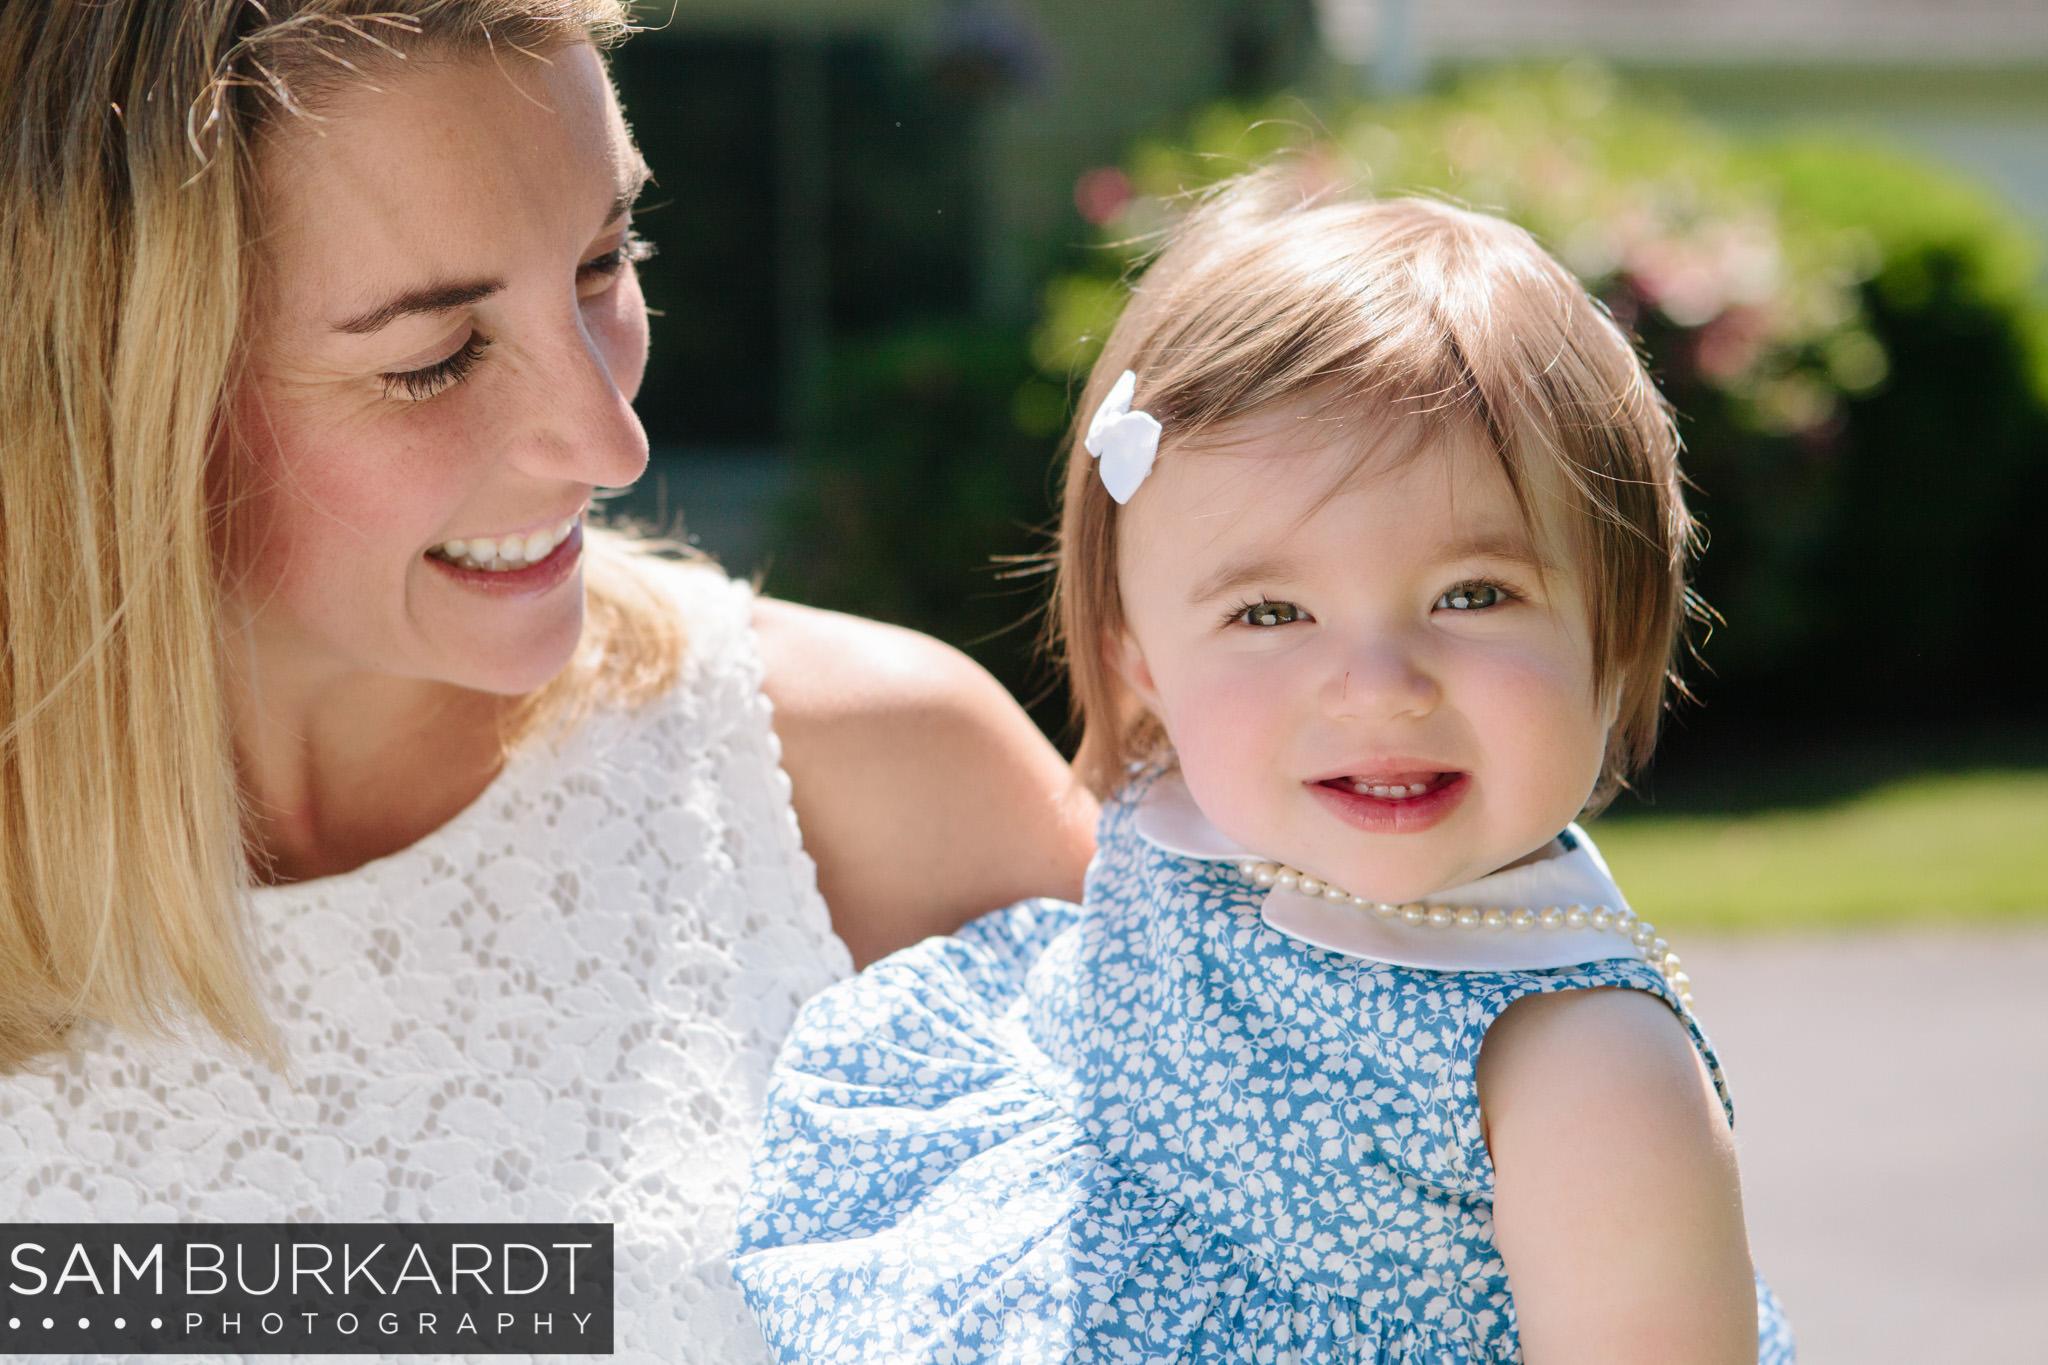 sburkardt_family_portraits_photoshoot_ridgefield_connecticut_summer_tea_party_006.jpg